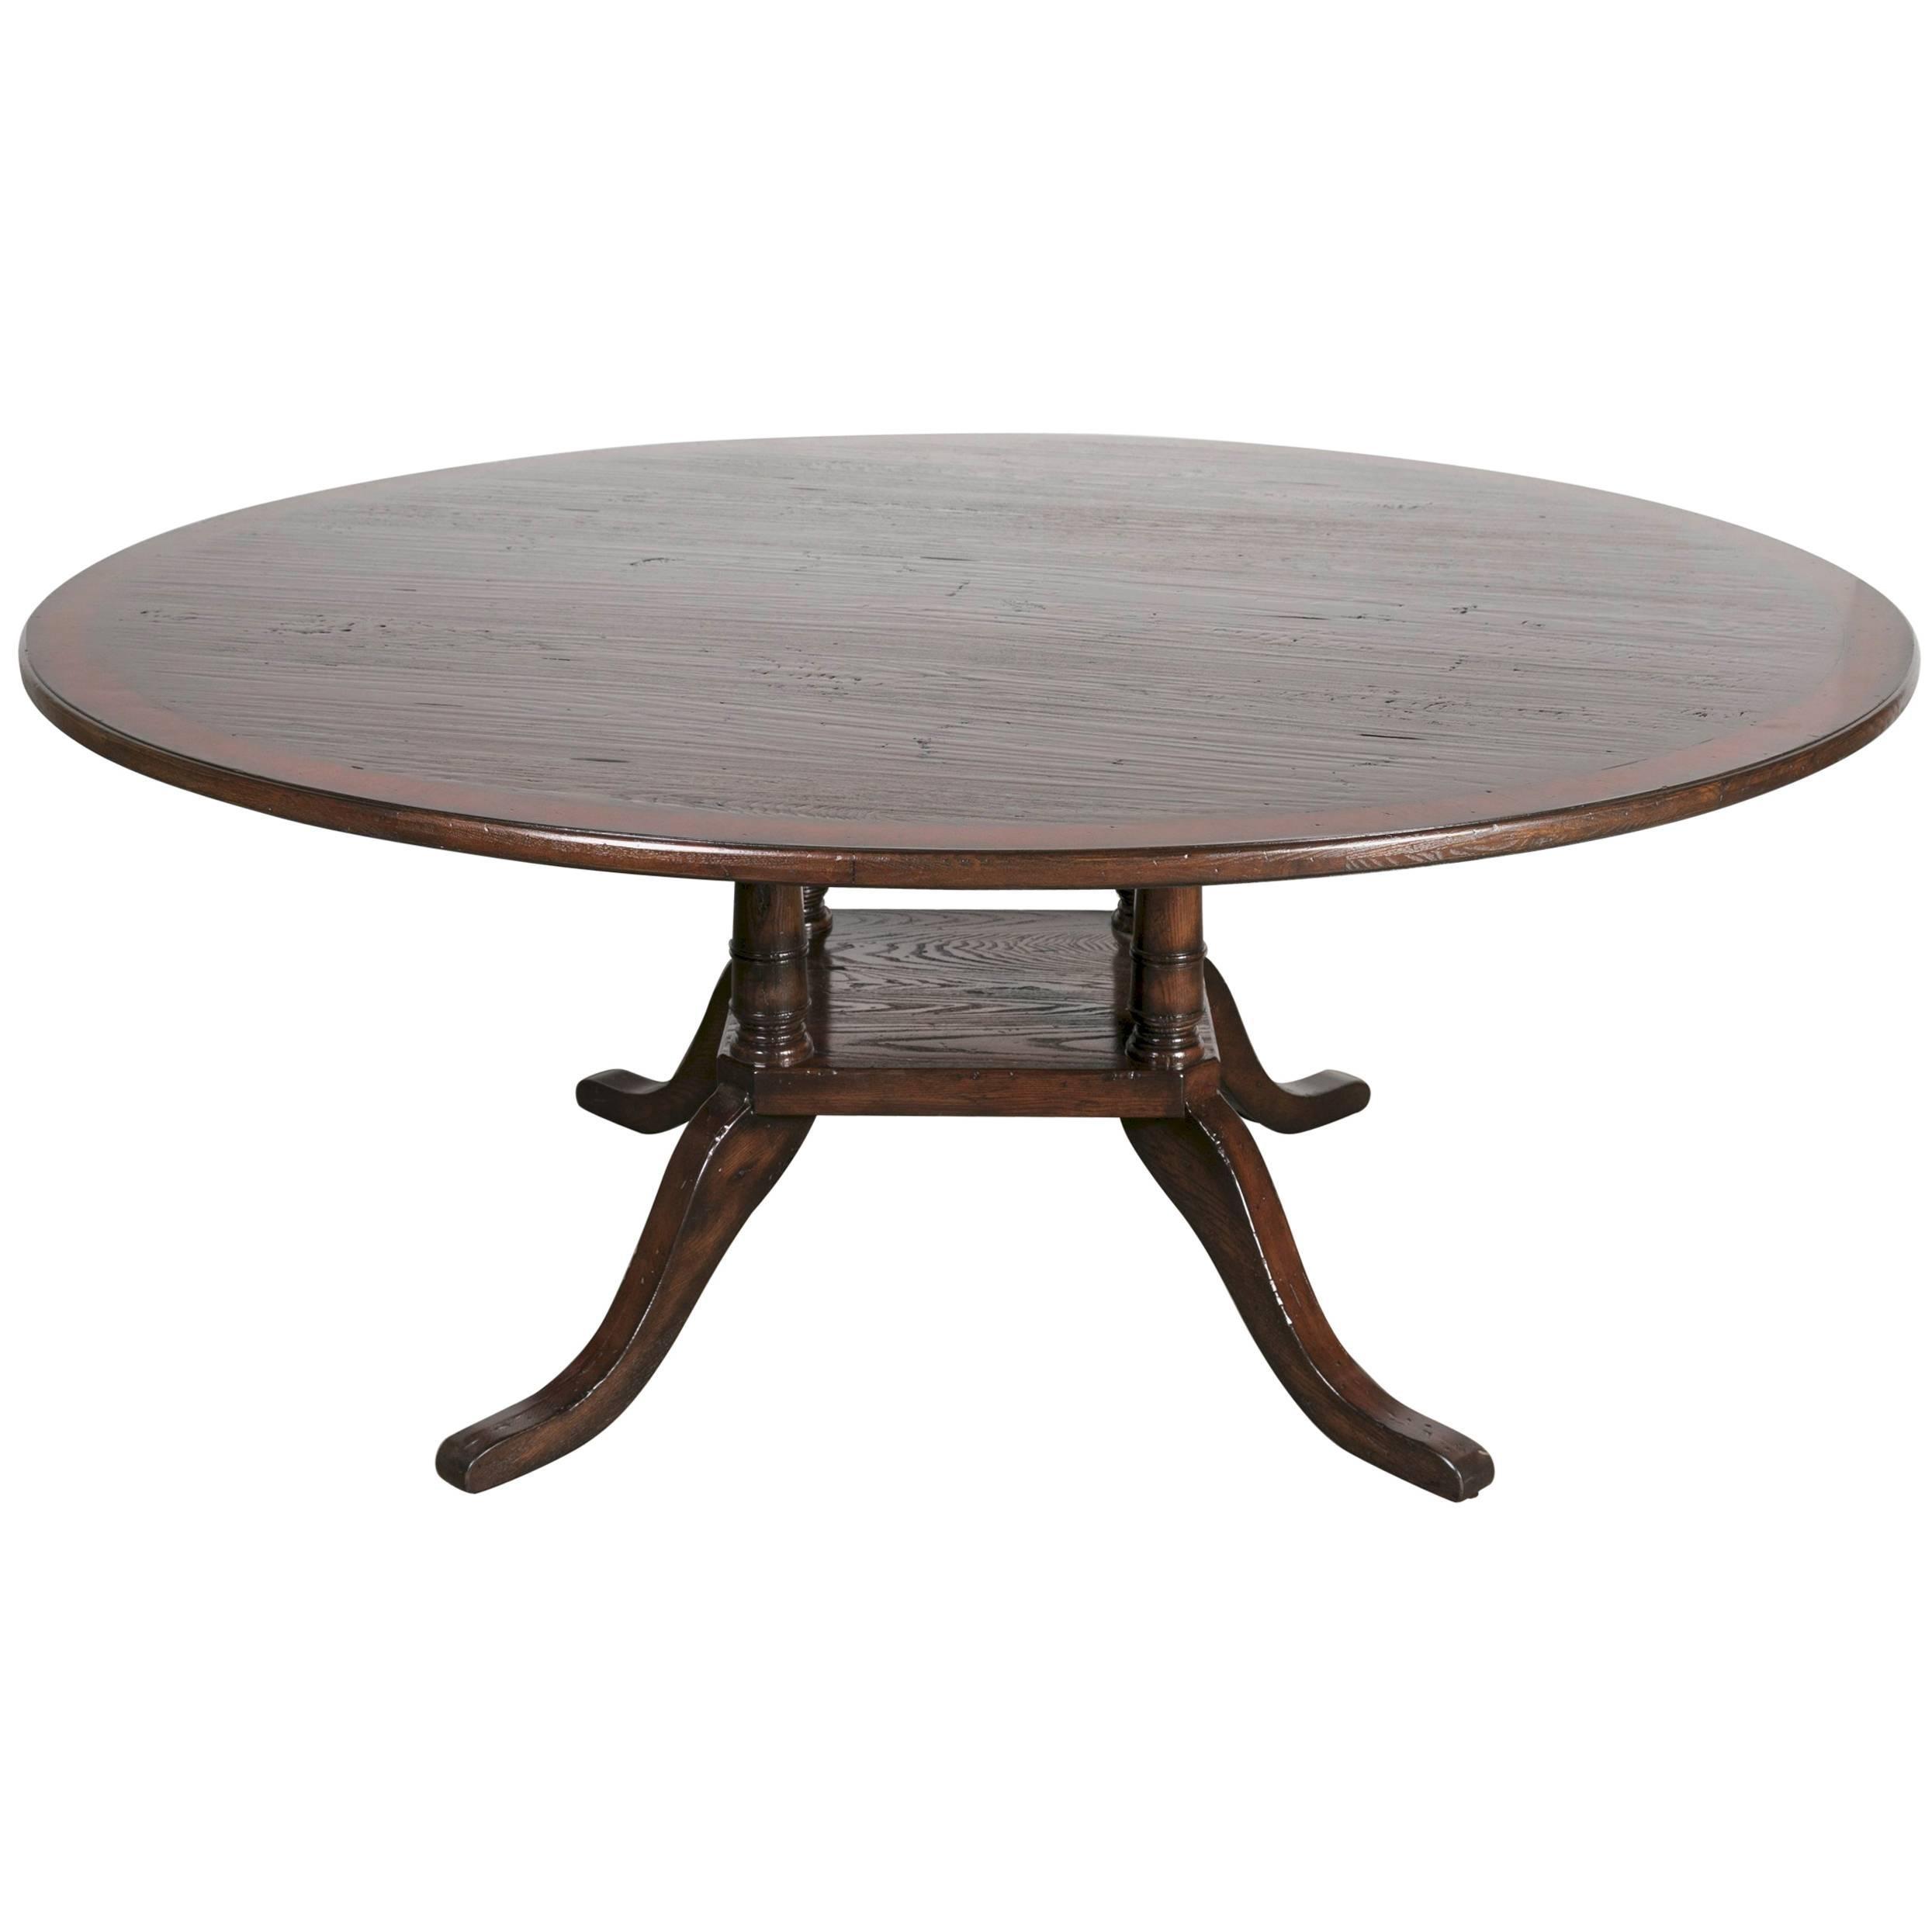 Georgian Style Round Birdcage Pedestal Dining Table